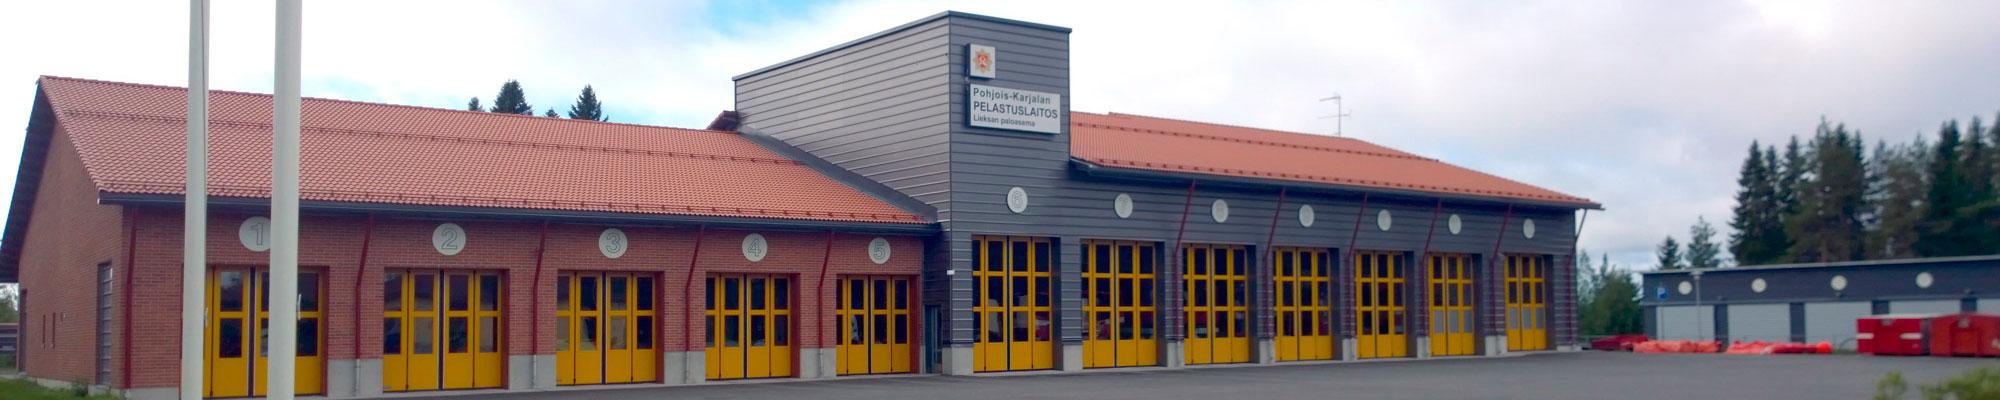 Pohjois-Karjalan Pelastuslaitos Lieksan paloasema